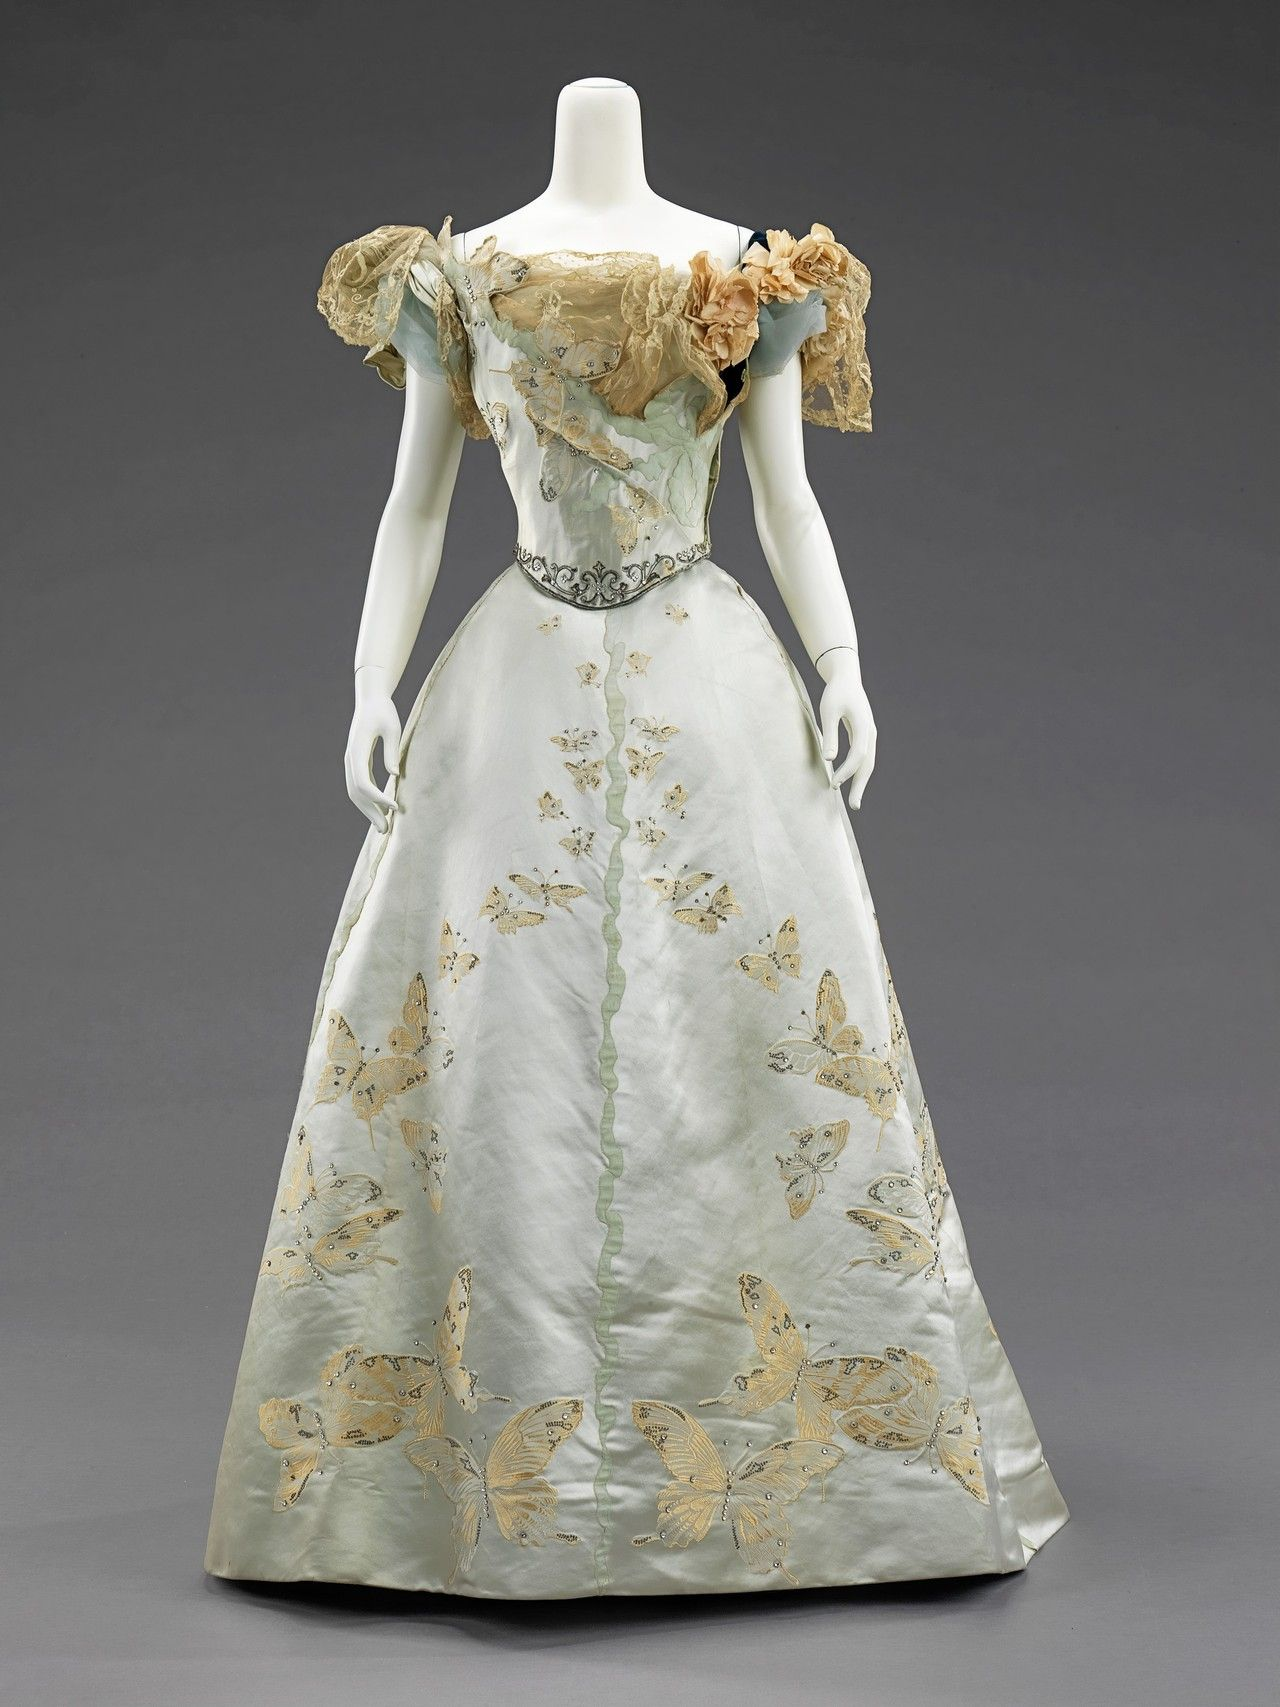 A beautifully embellished worth dress victorian fashion